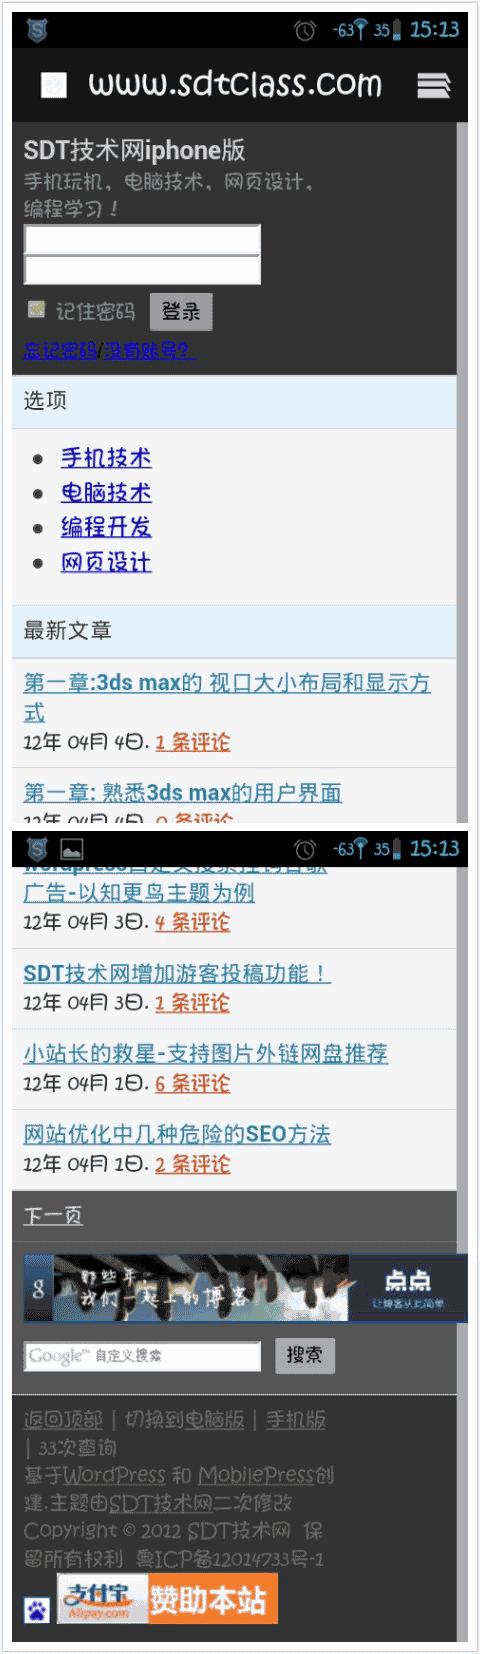 mobilepress[wordpress手机插件]sdt技术网修改汉化版